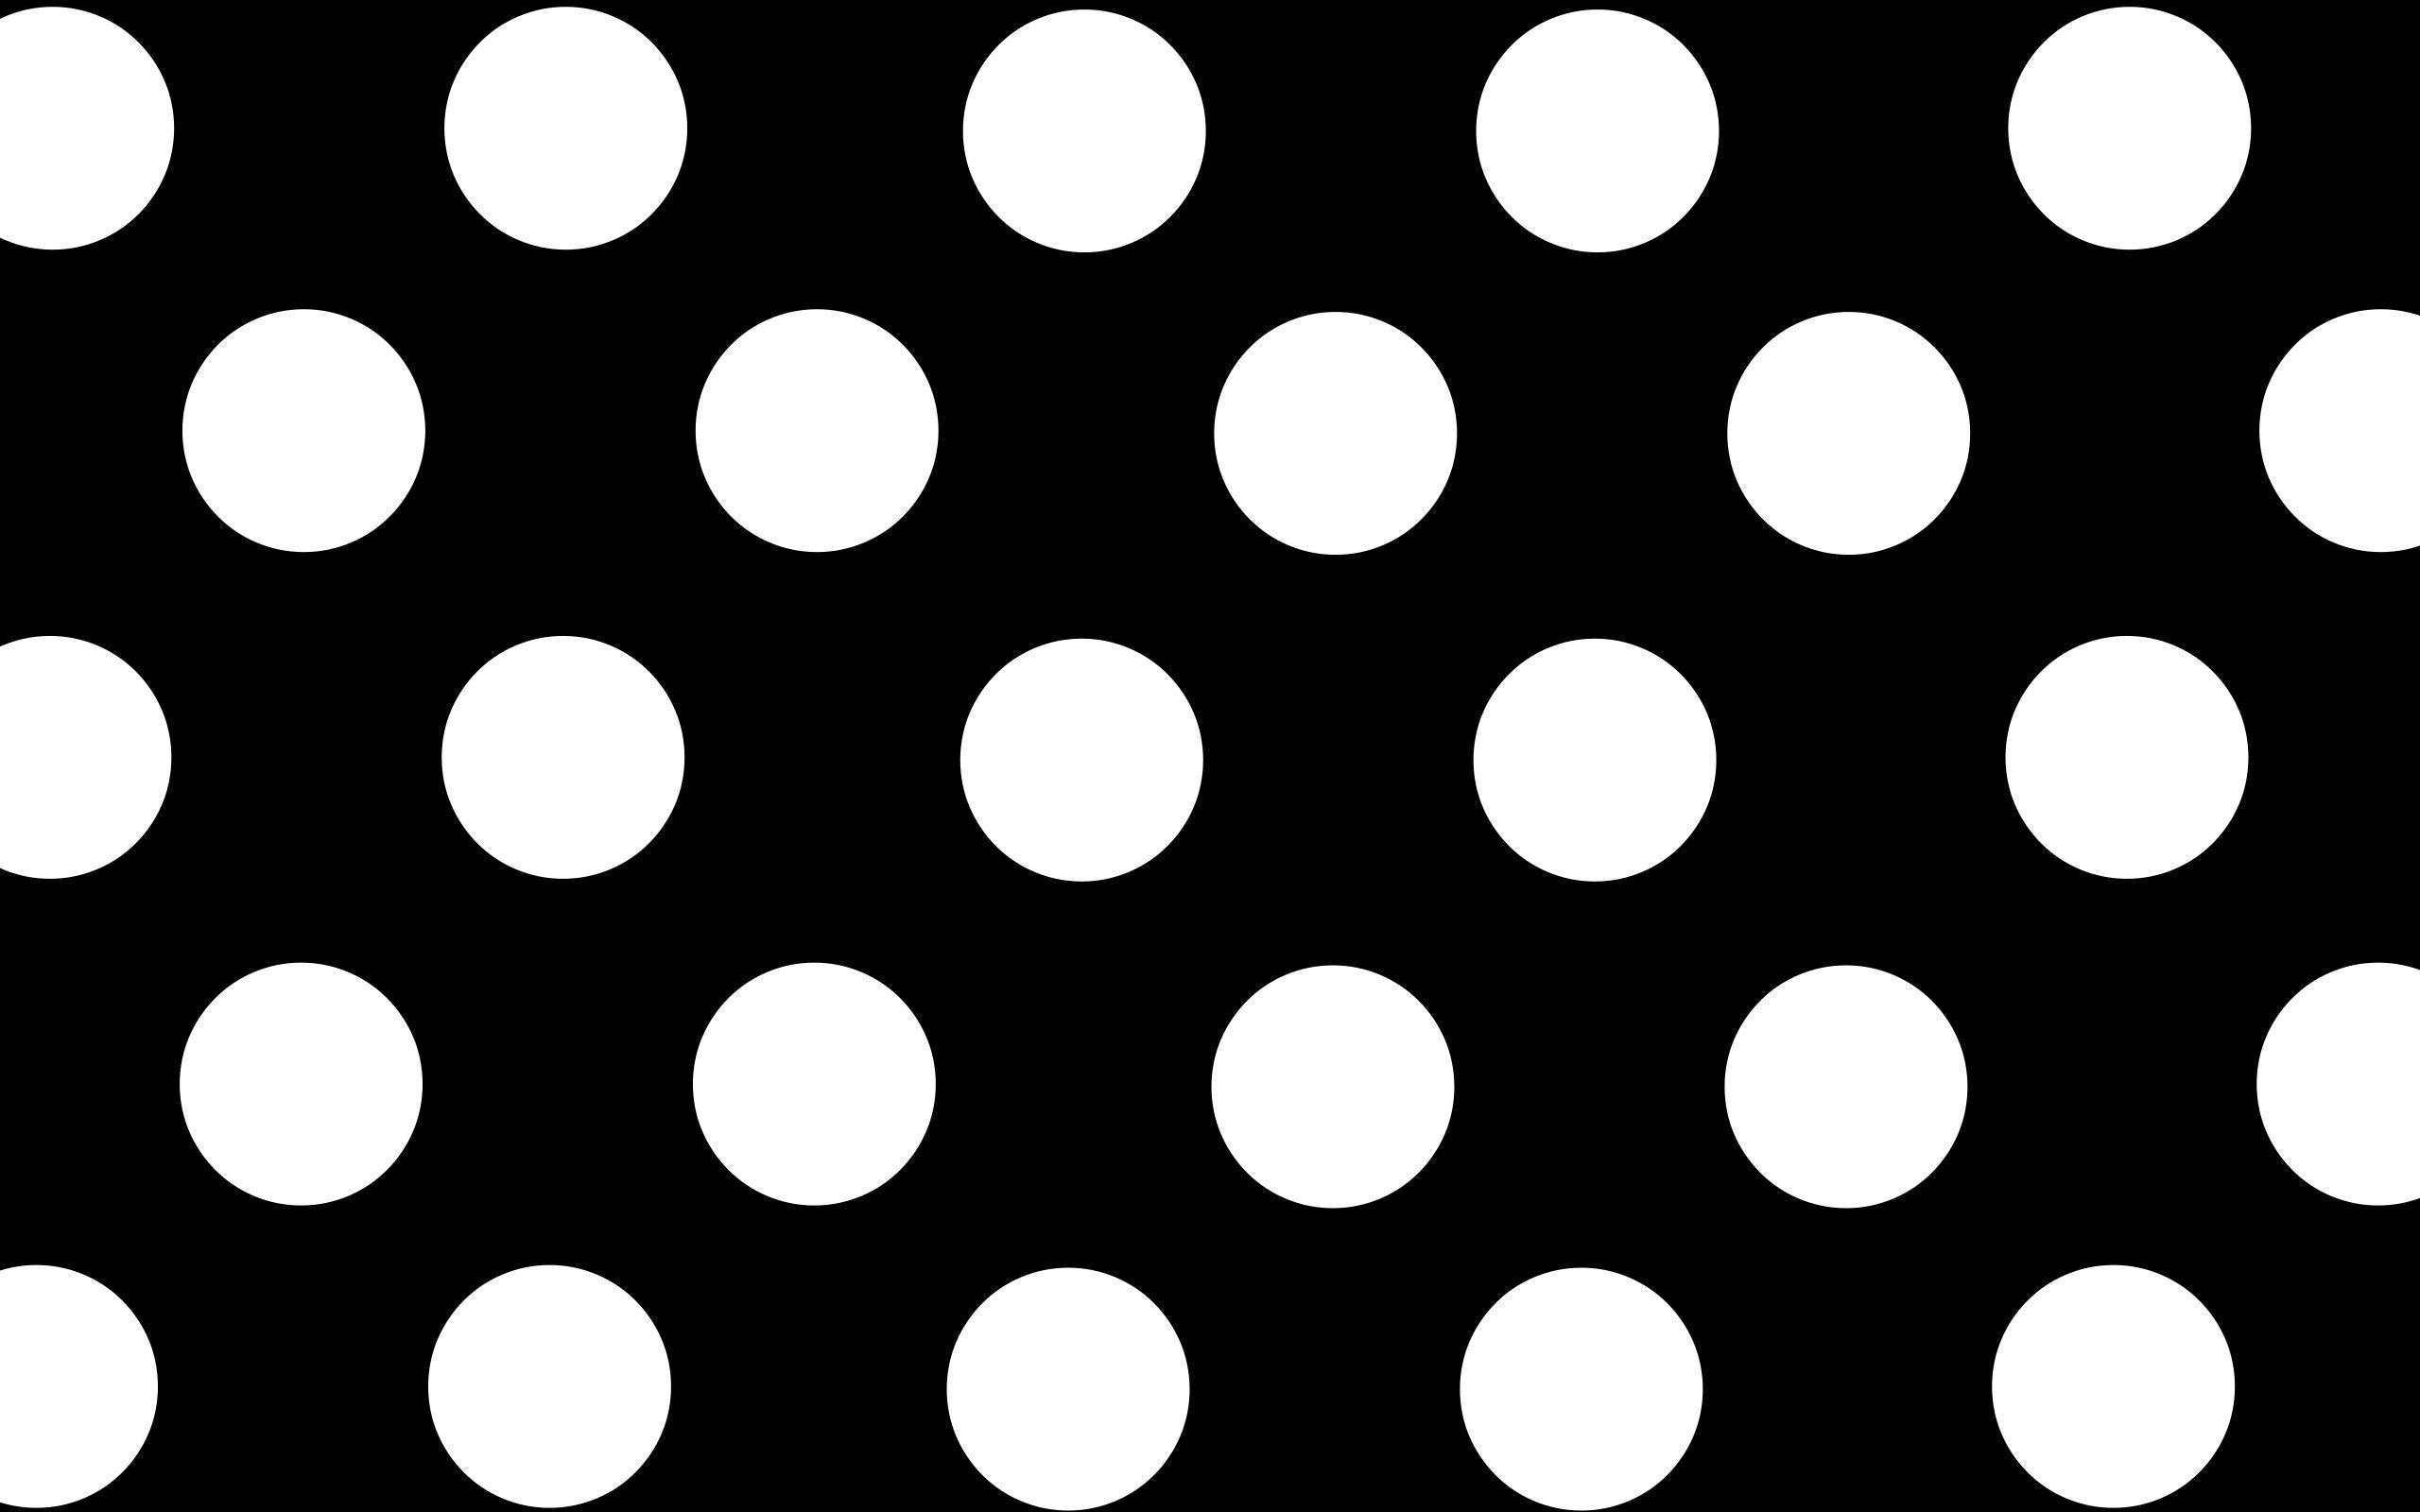 black polka dot background wallpapers hd wallpaper